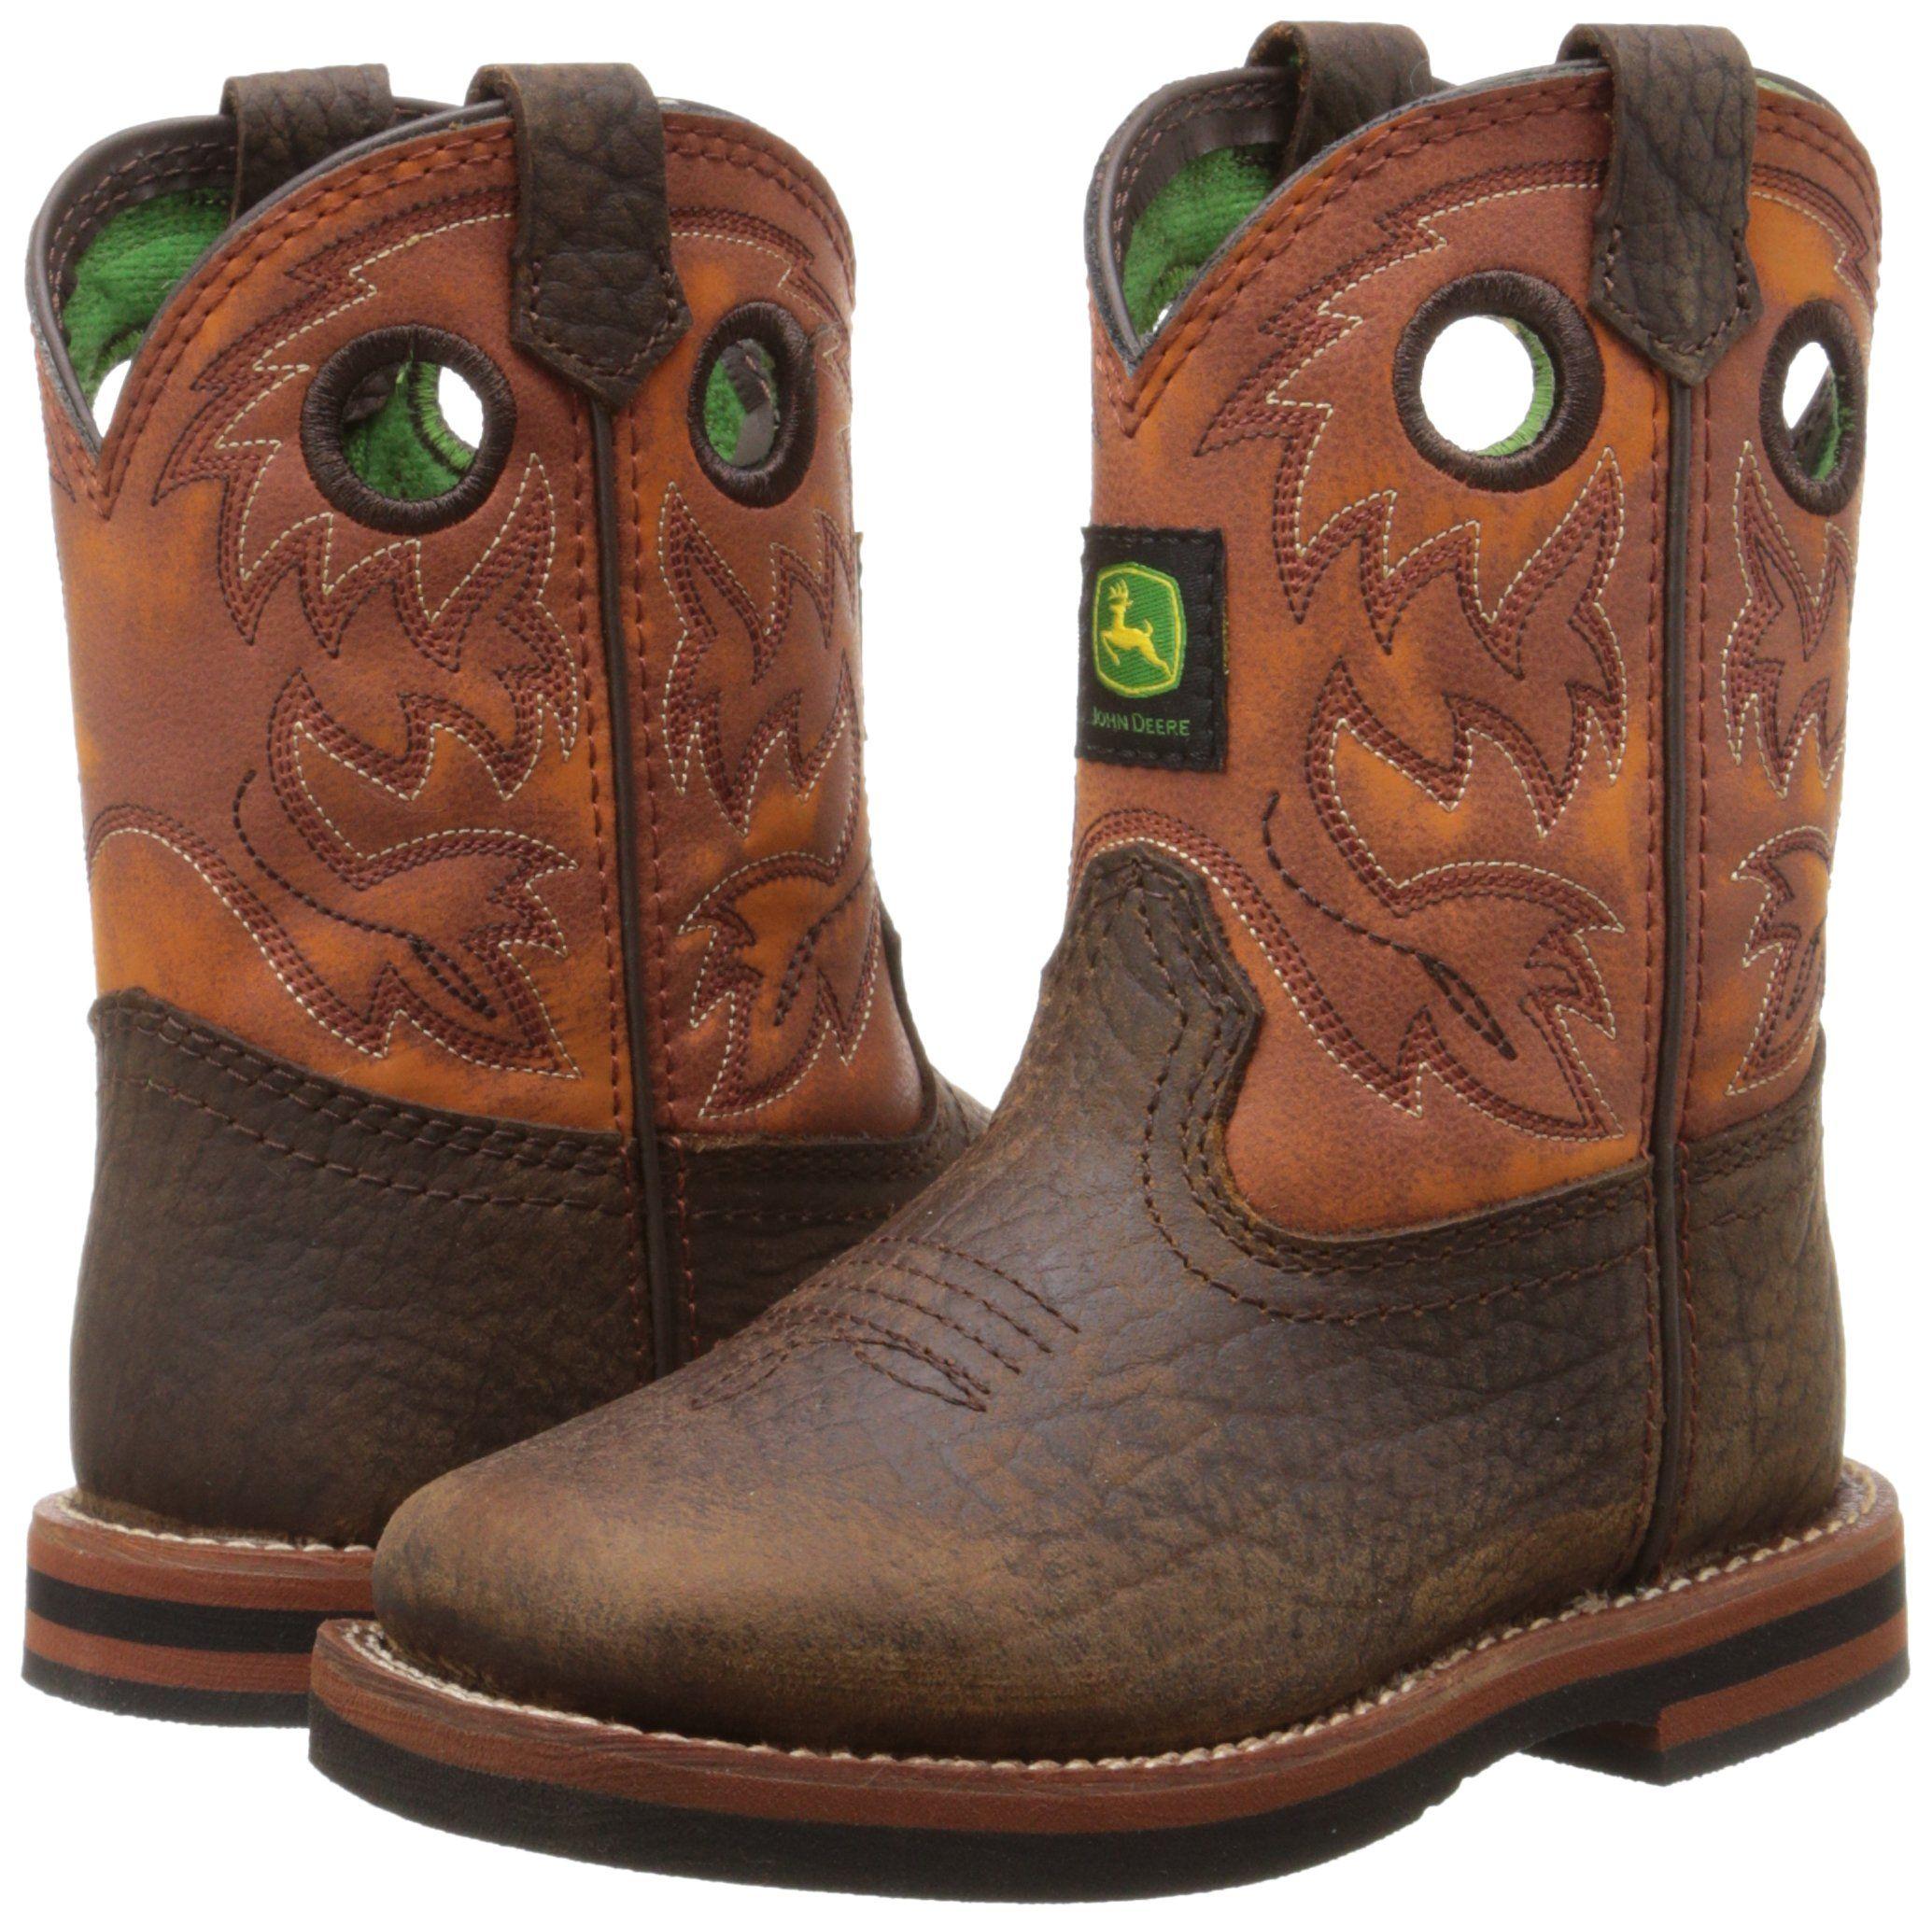 John Deere 1318 Western Boot Toddler